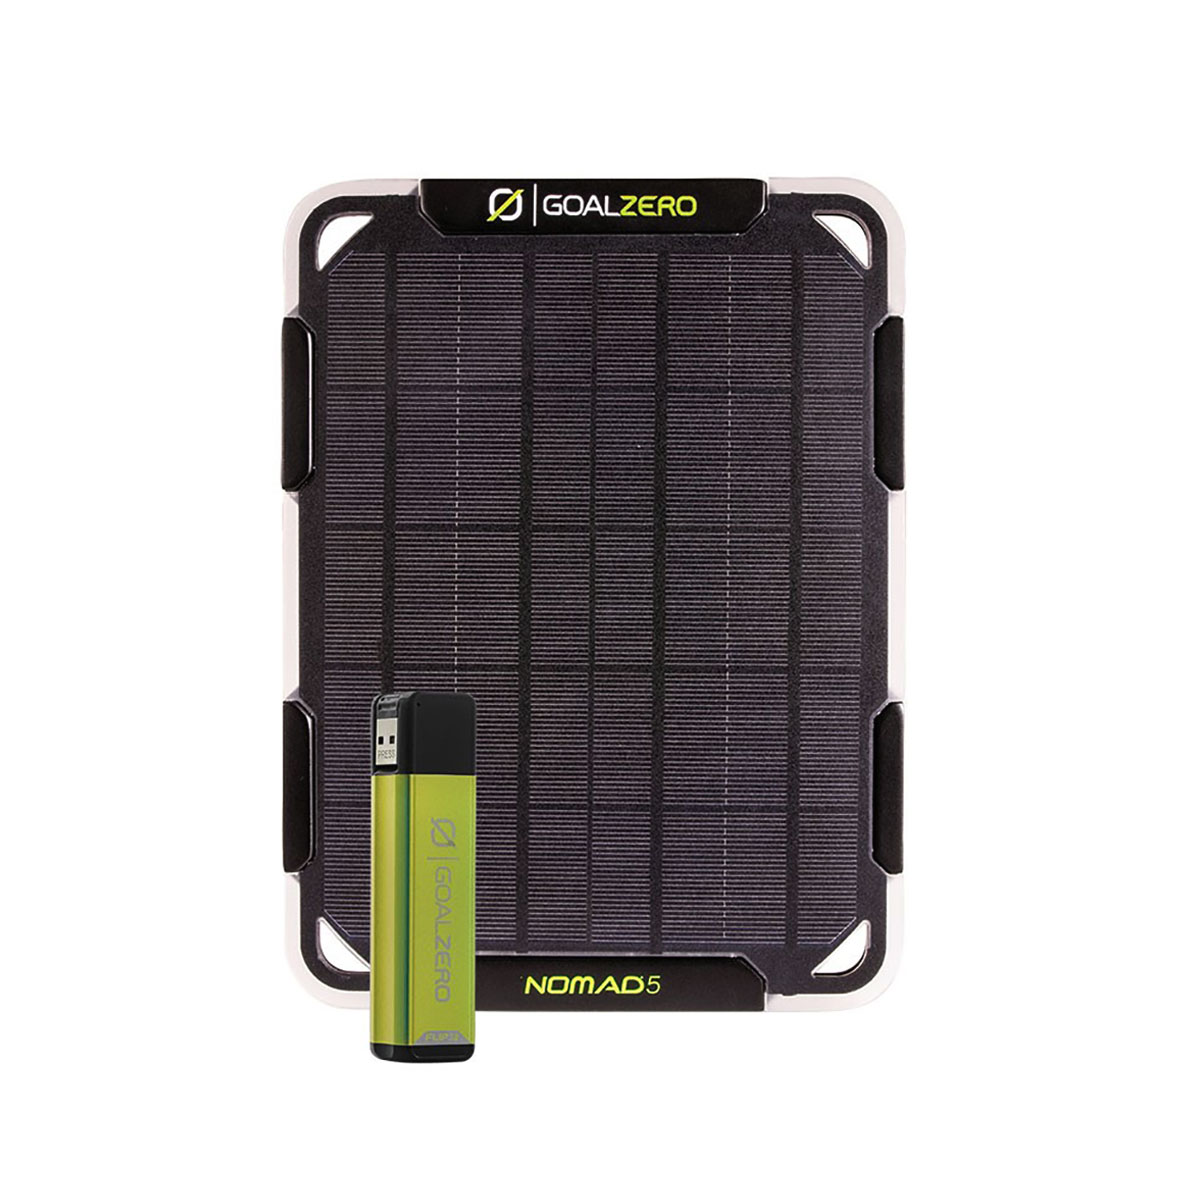 nomad 5 solar kit goal zero solcelllsladdare solpanel samt power bank flip 12